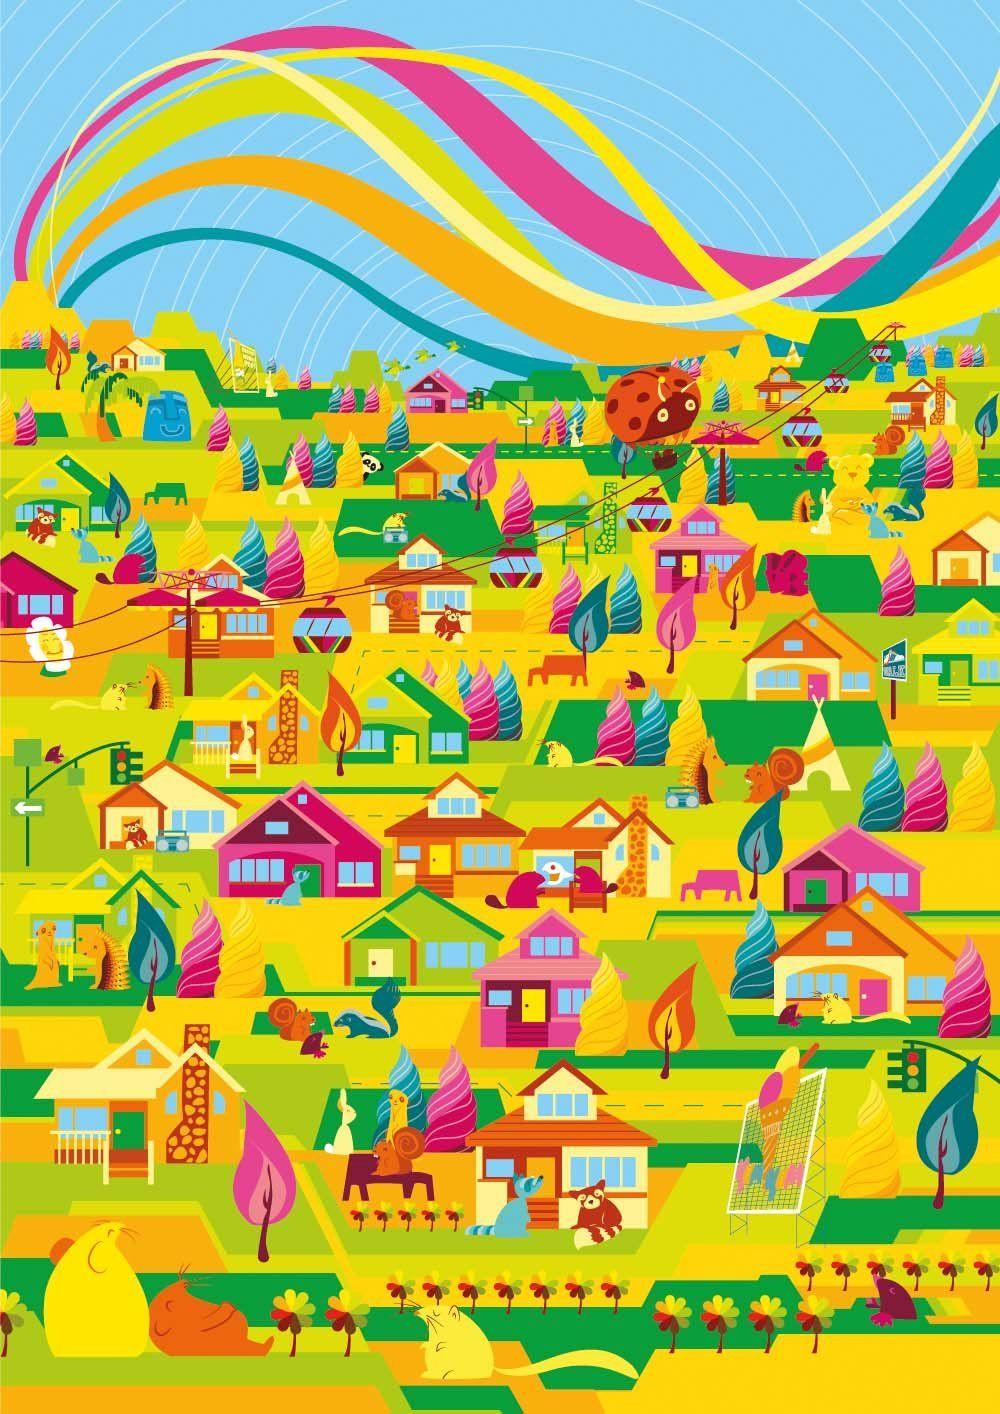 Poster design using illustrator - Adobe Illustrator Tutorial Create A Super Bright And Colourful Vector Poster In Illustrator Digital Arts Adobe Illustrator Pinterest Adobe